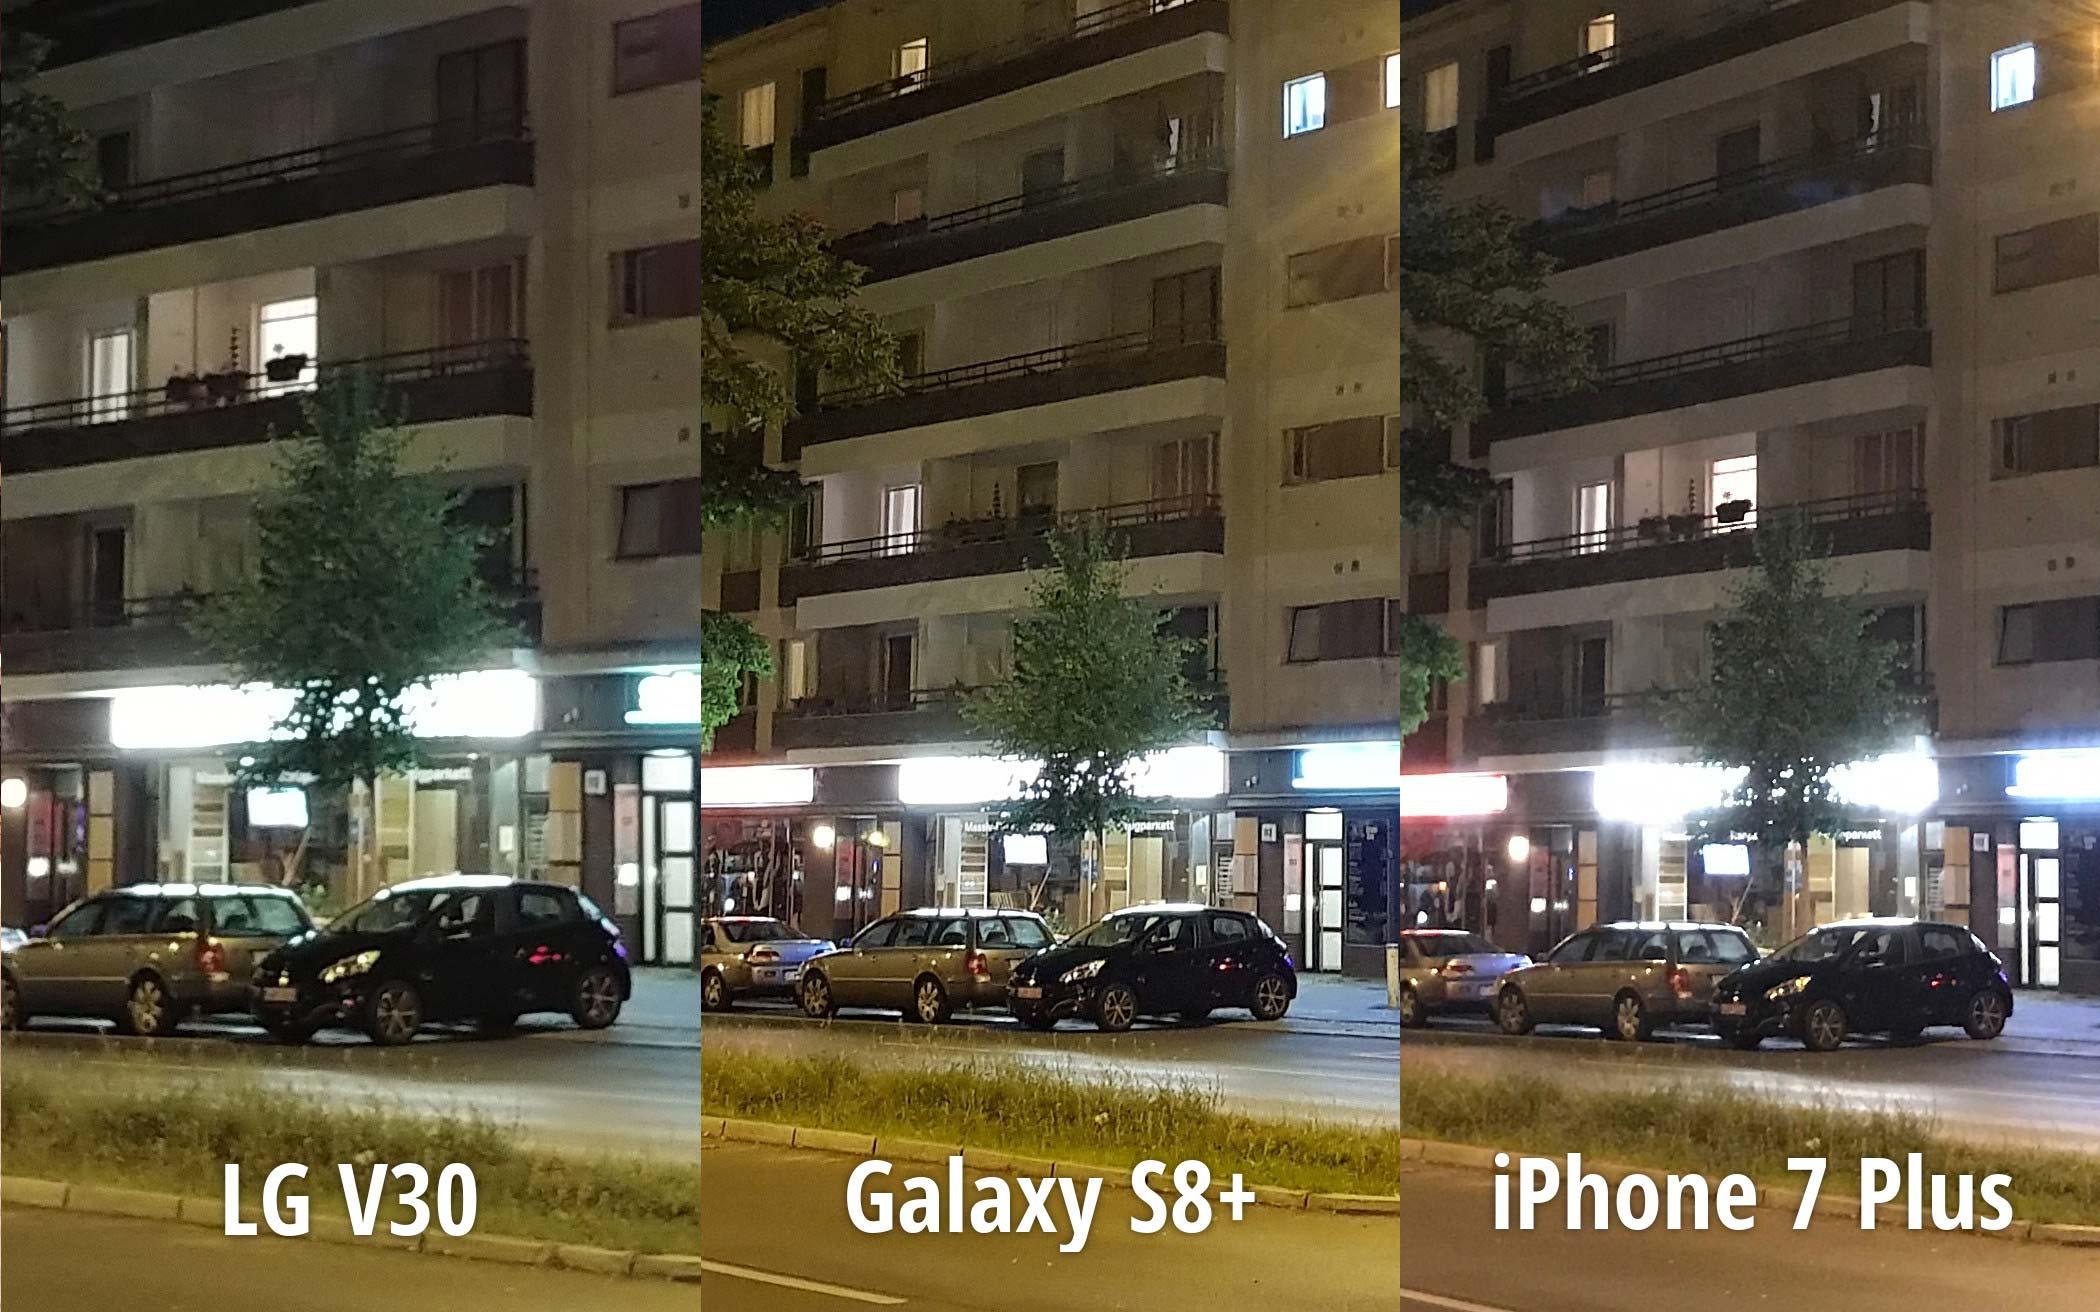 LG-V30-vs-Galaxy-S8-vs-iPhone-7-Plus-camera-photo-samples-(5).jpg